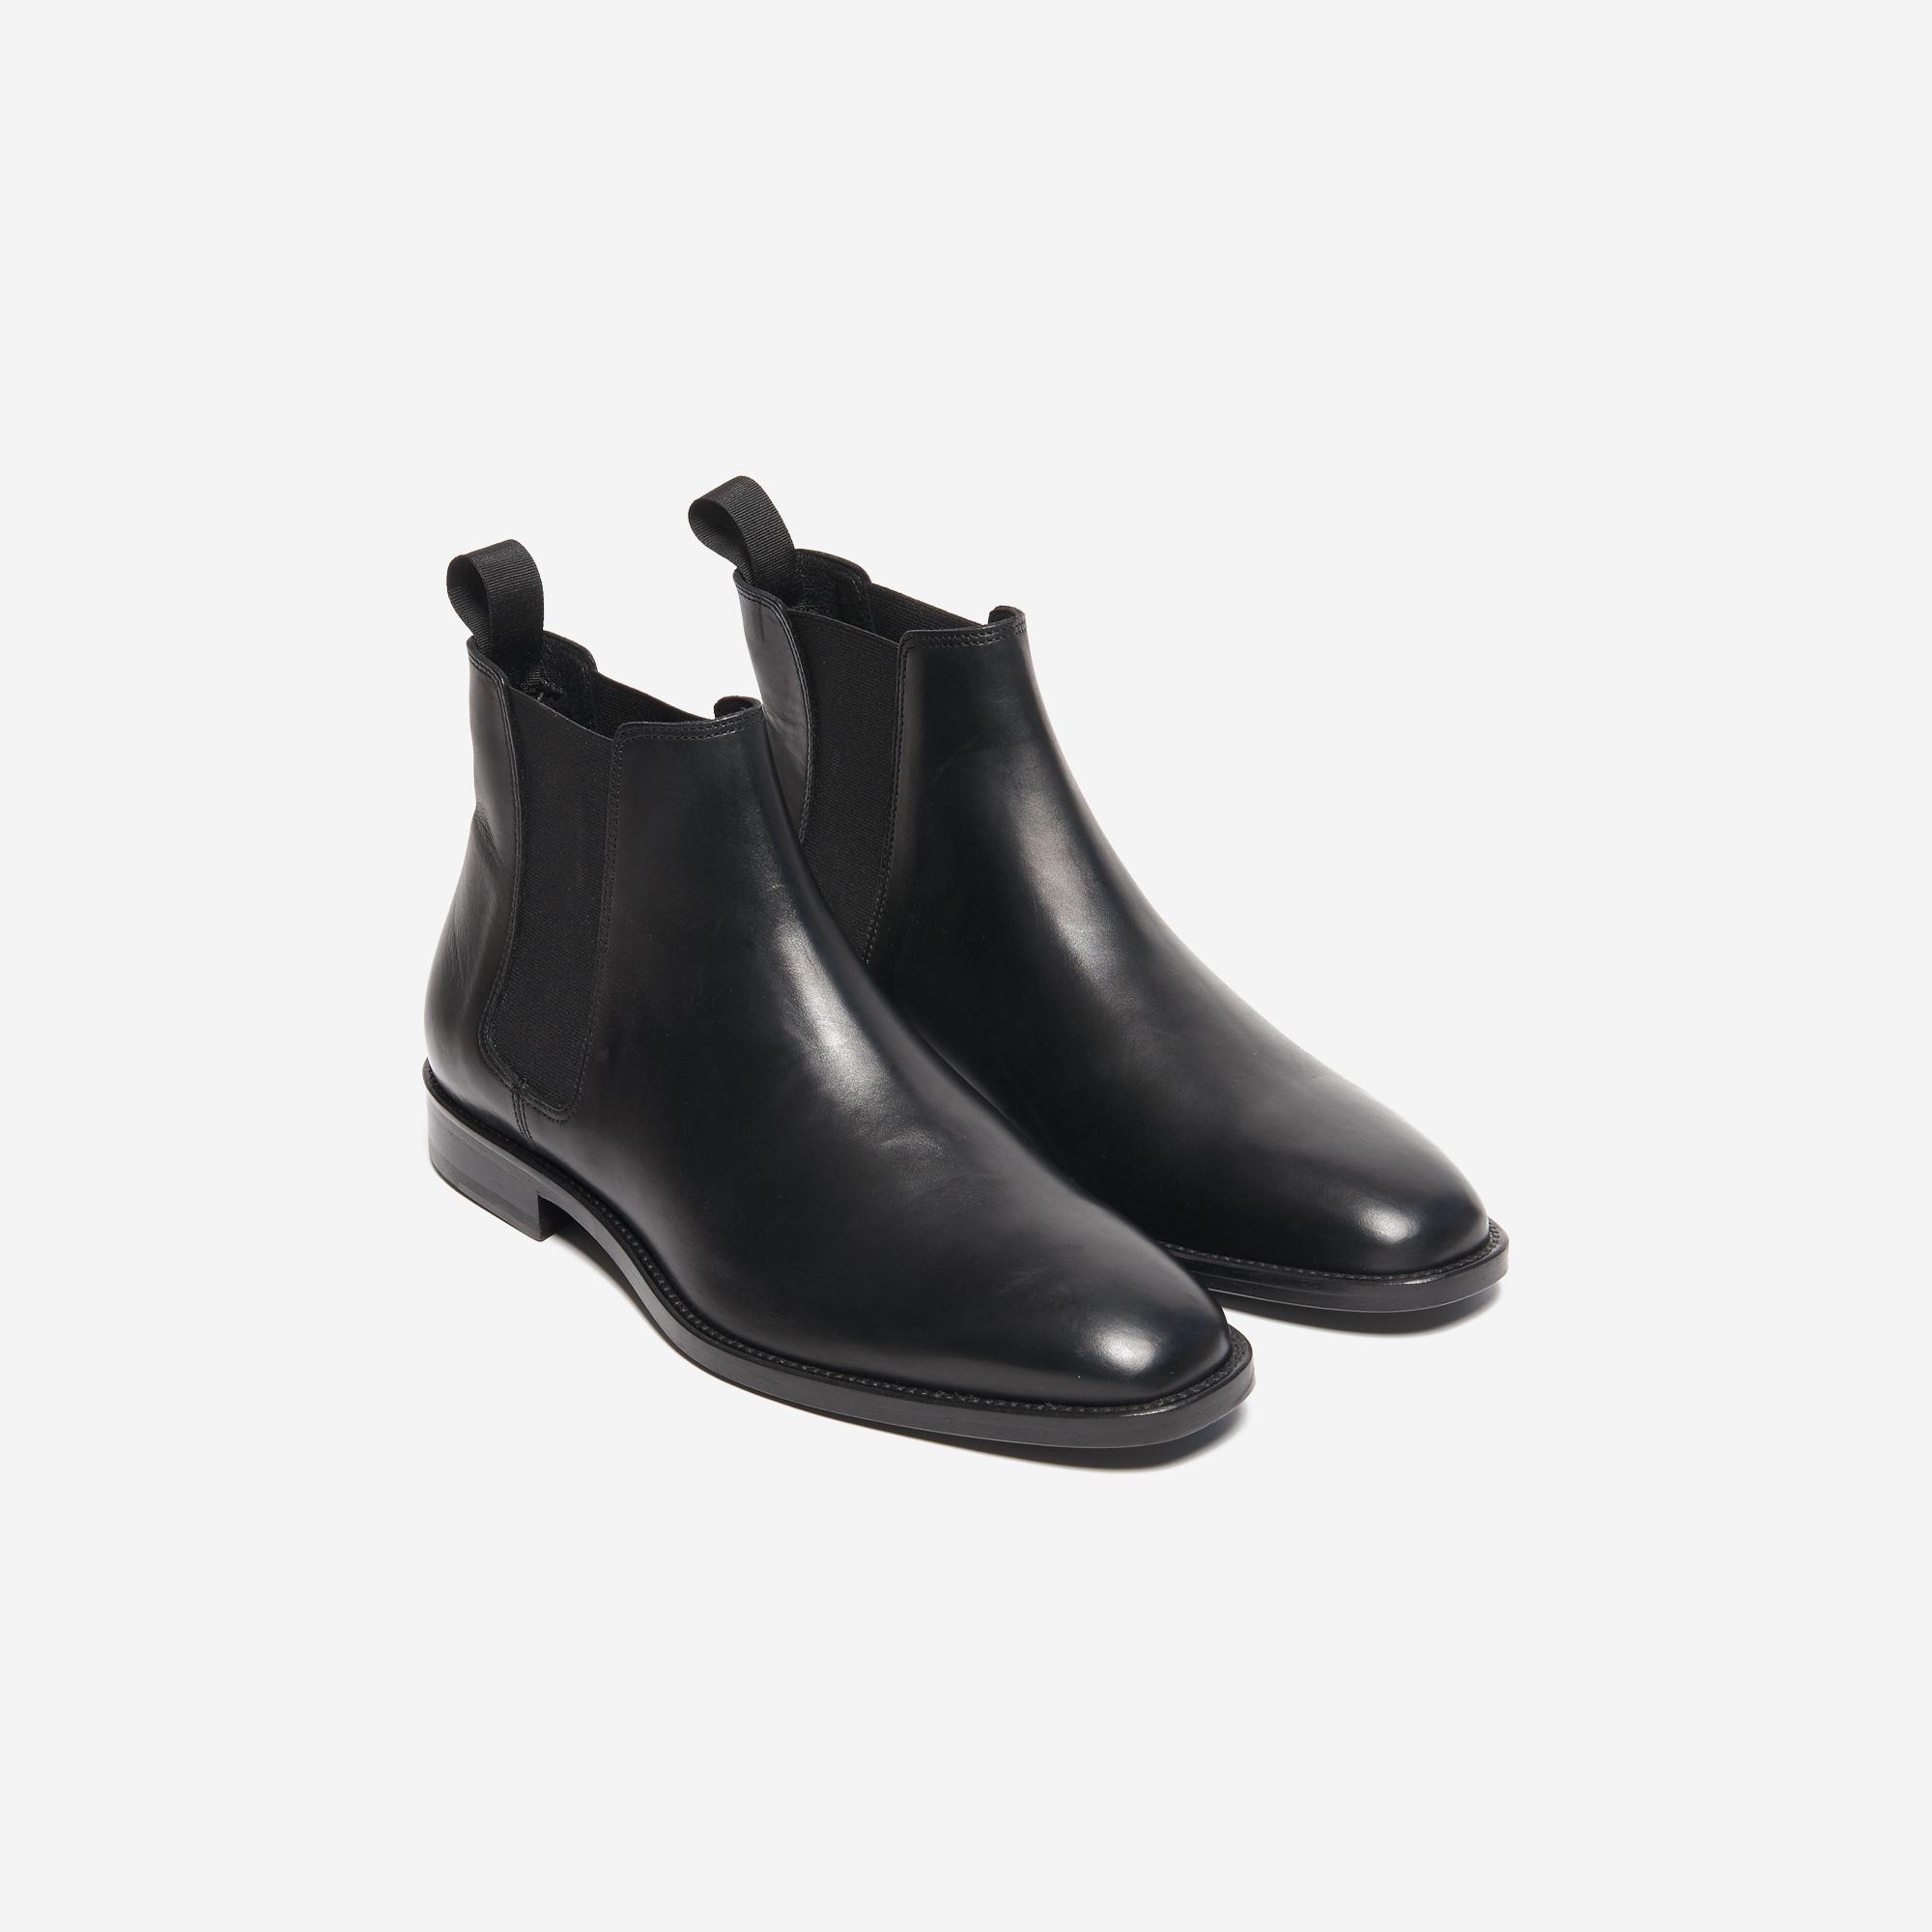 e82c4df398e Leather Chelsea ankle boots